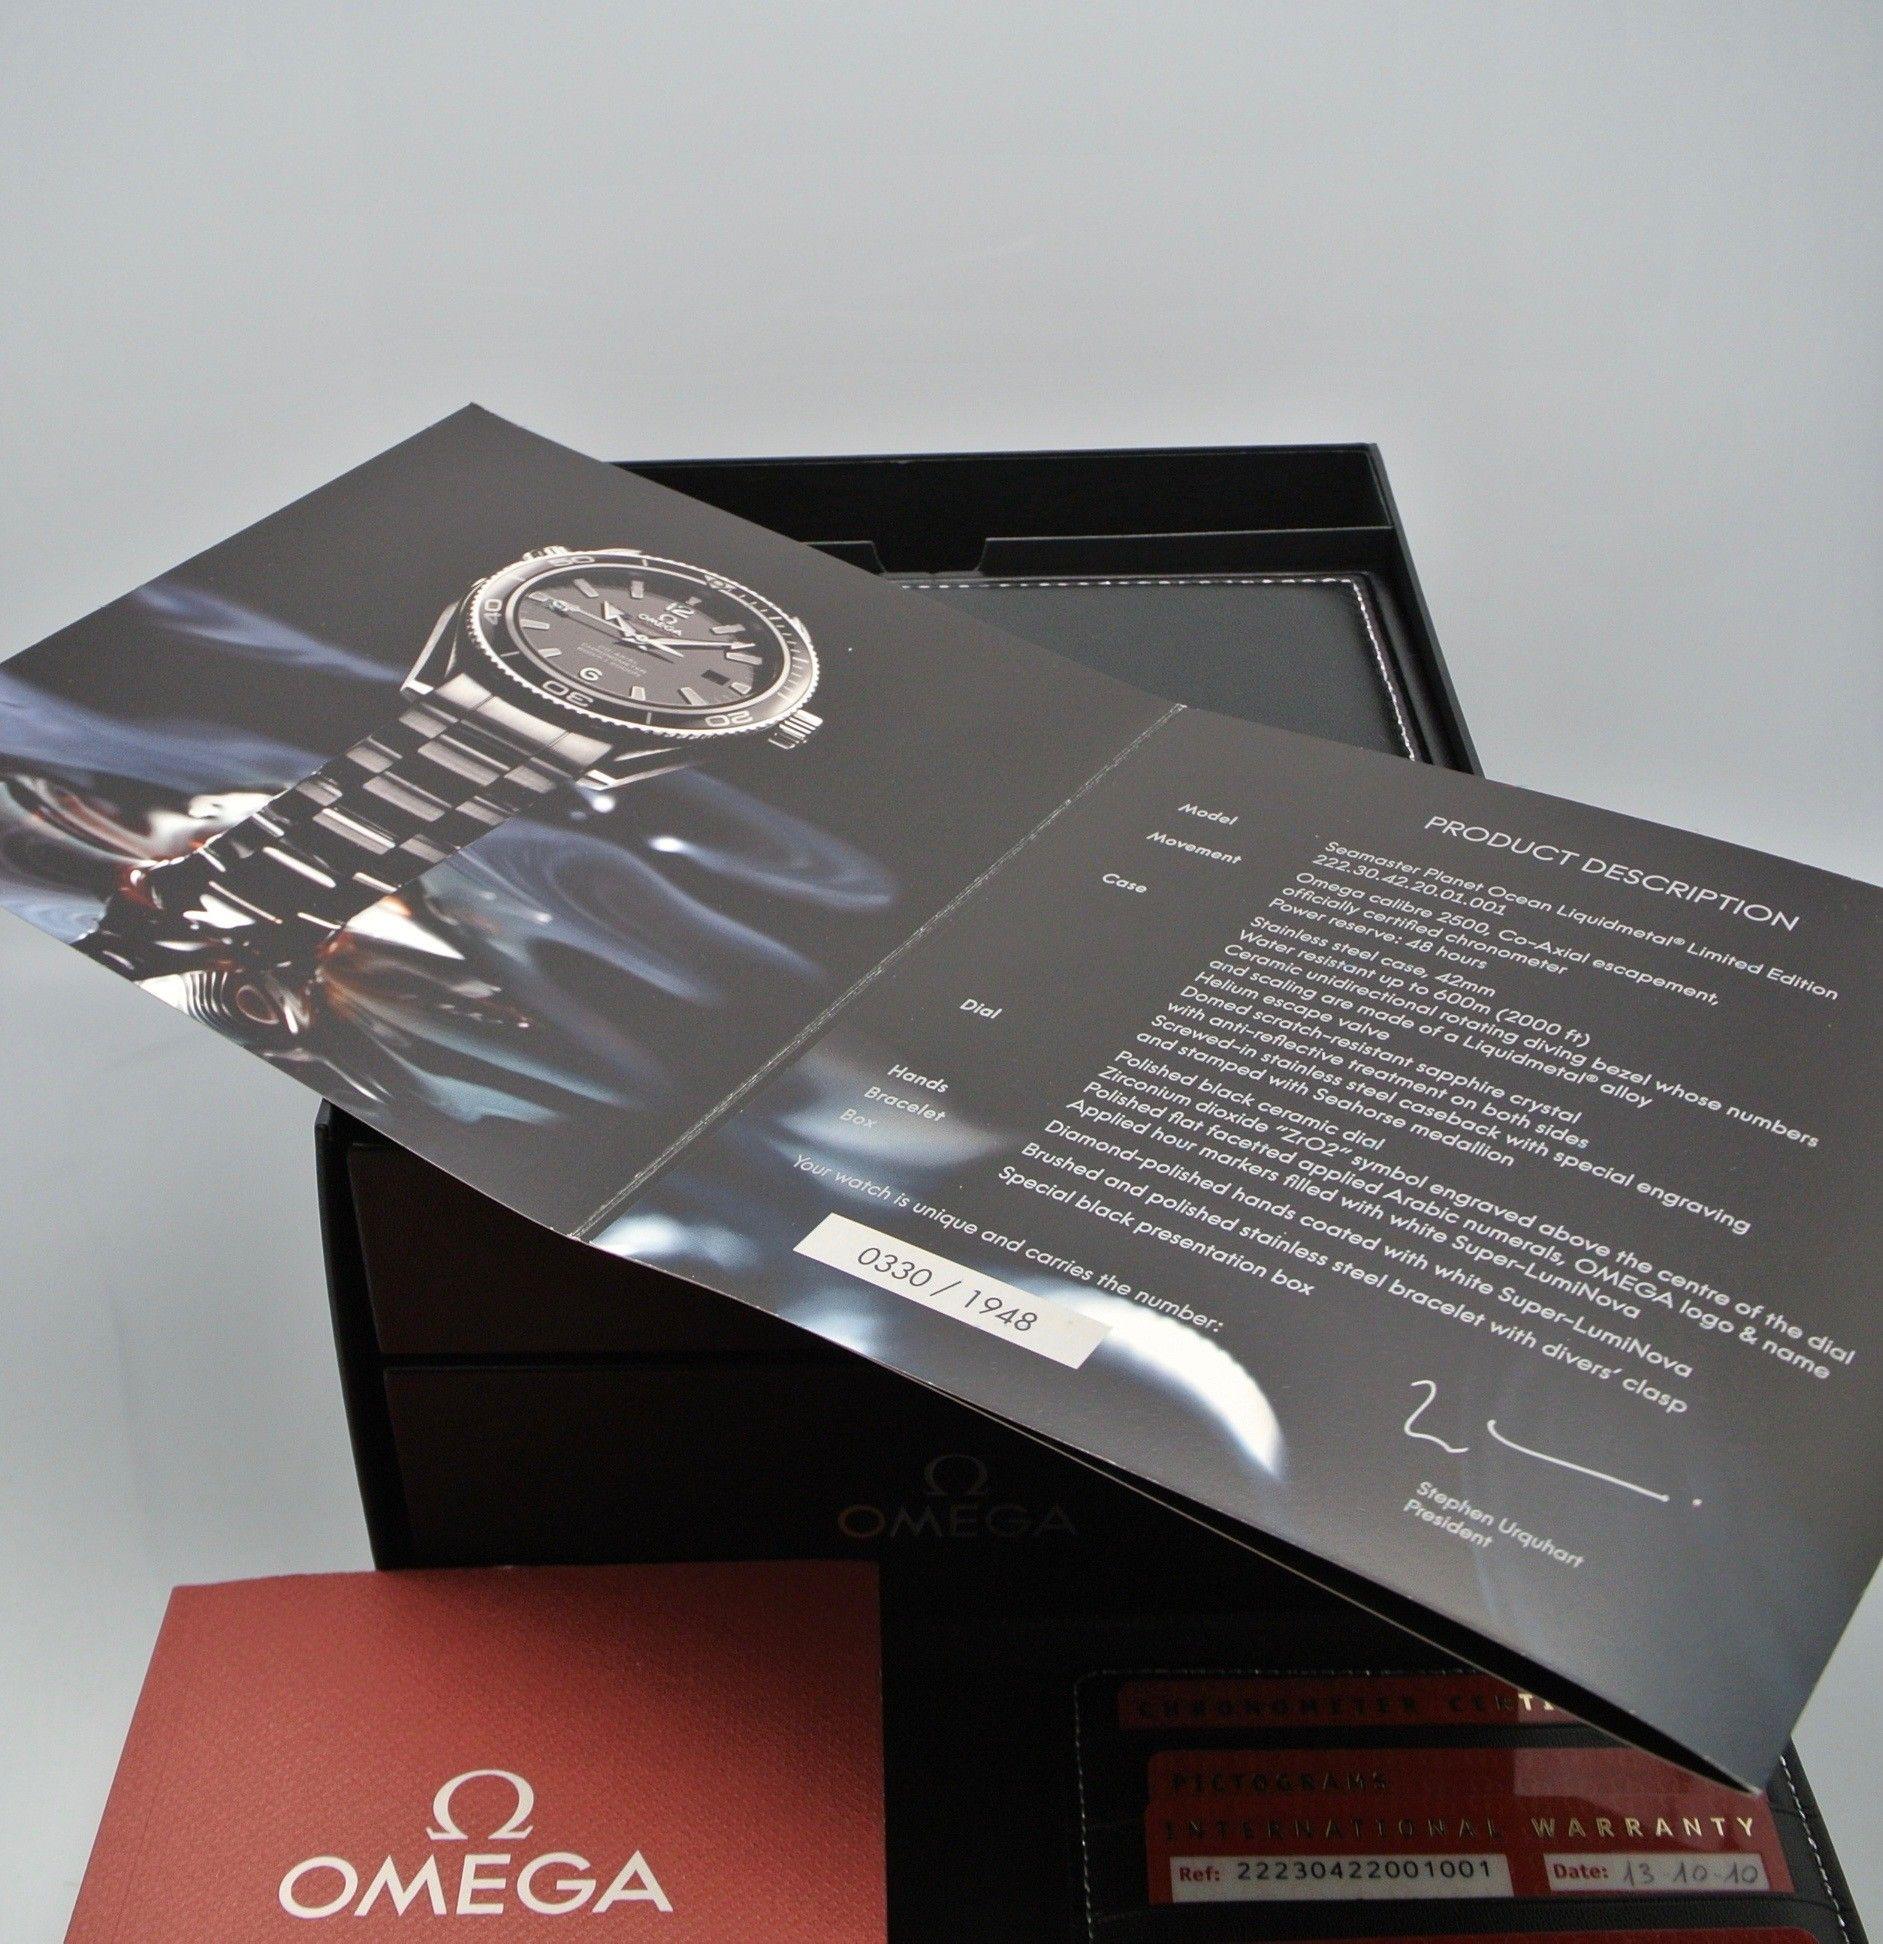 Omega Seamaster Planet Ocean LIQUIDMETAL Limited Edition 1948 pz NOS